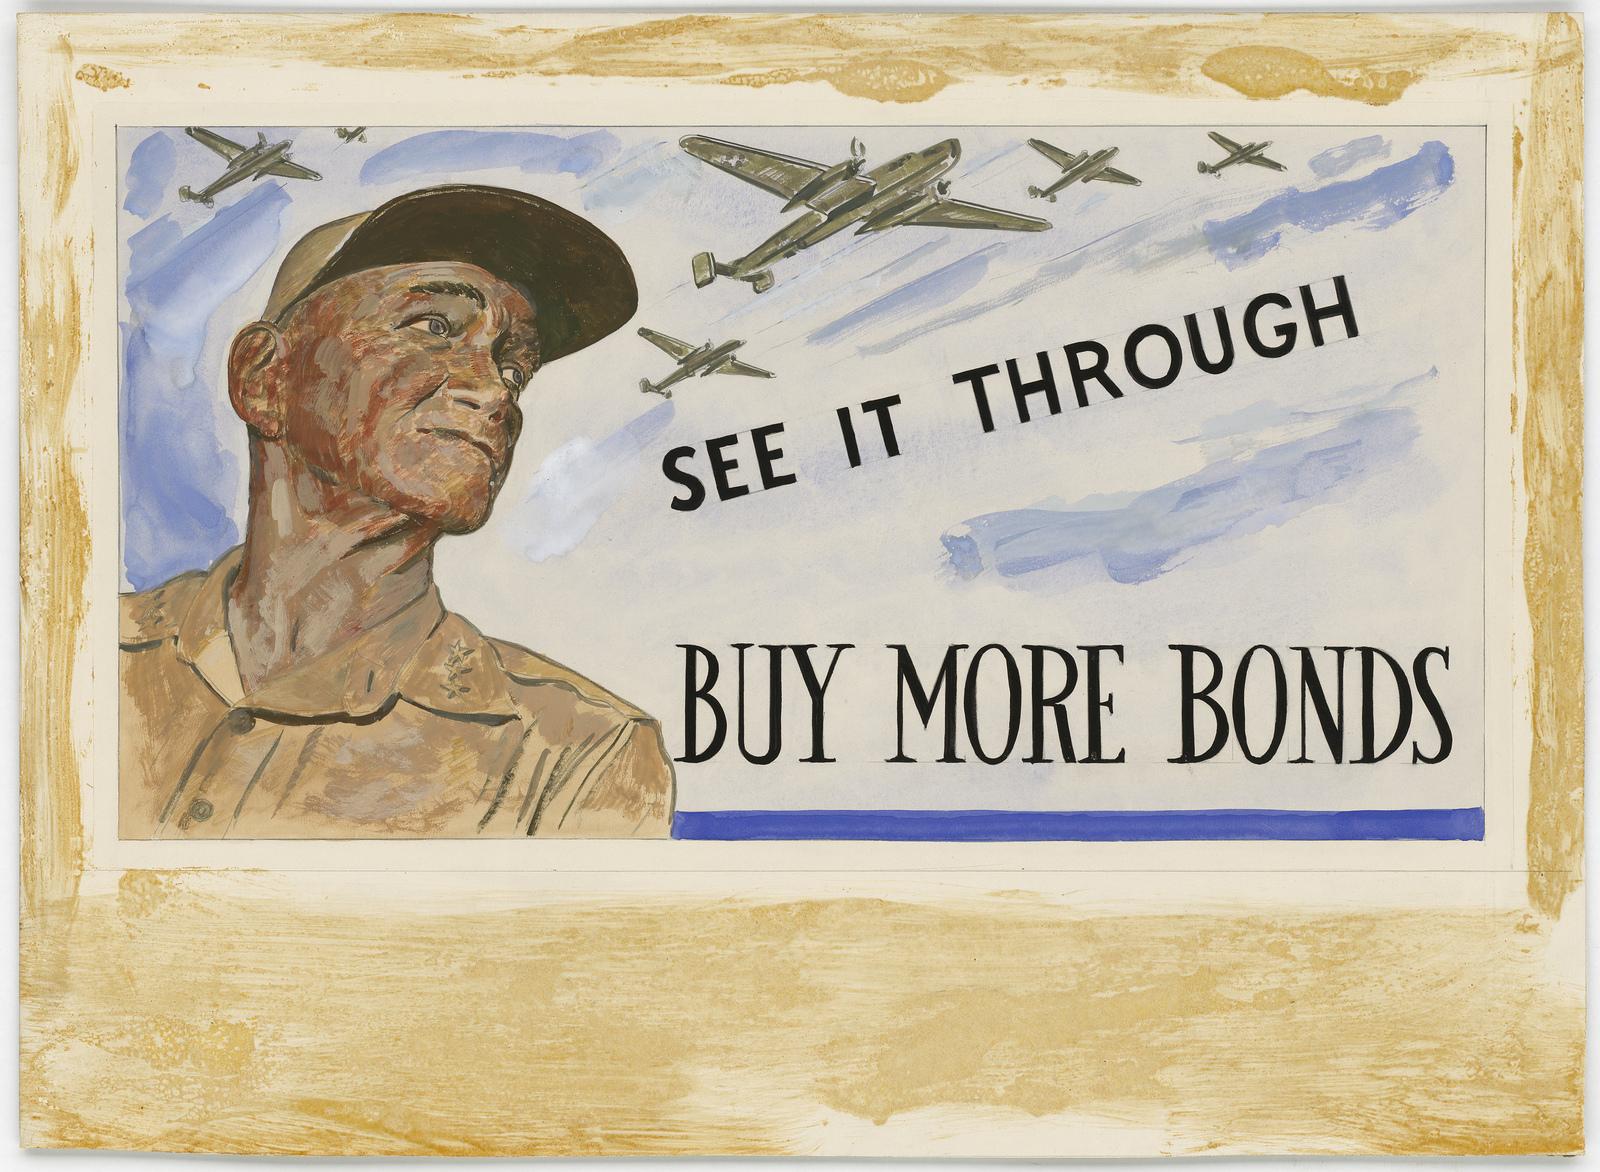 See It Through. Buy More Bonds